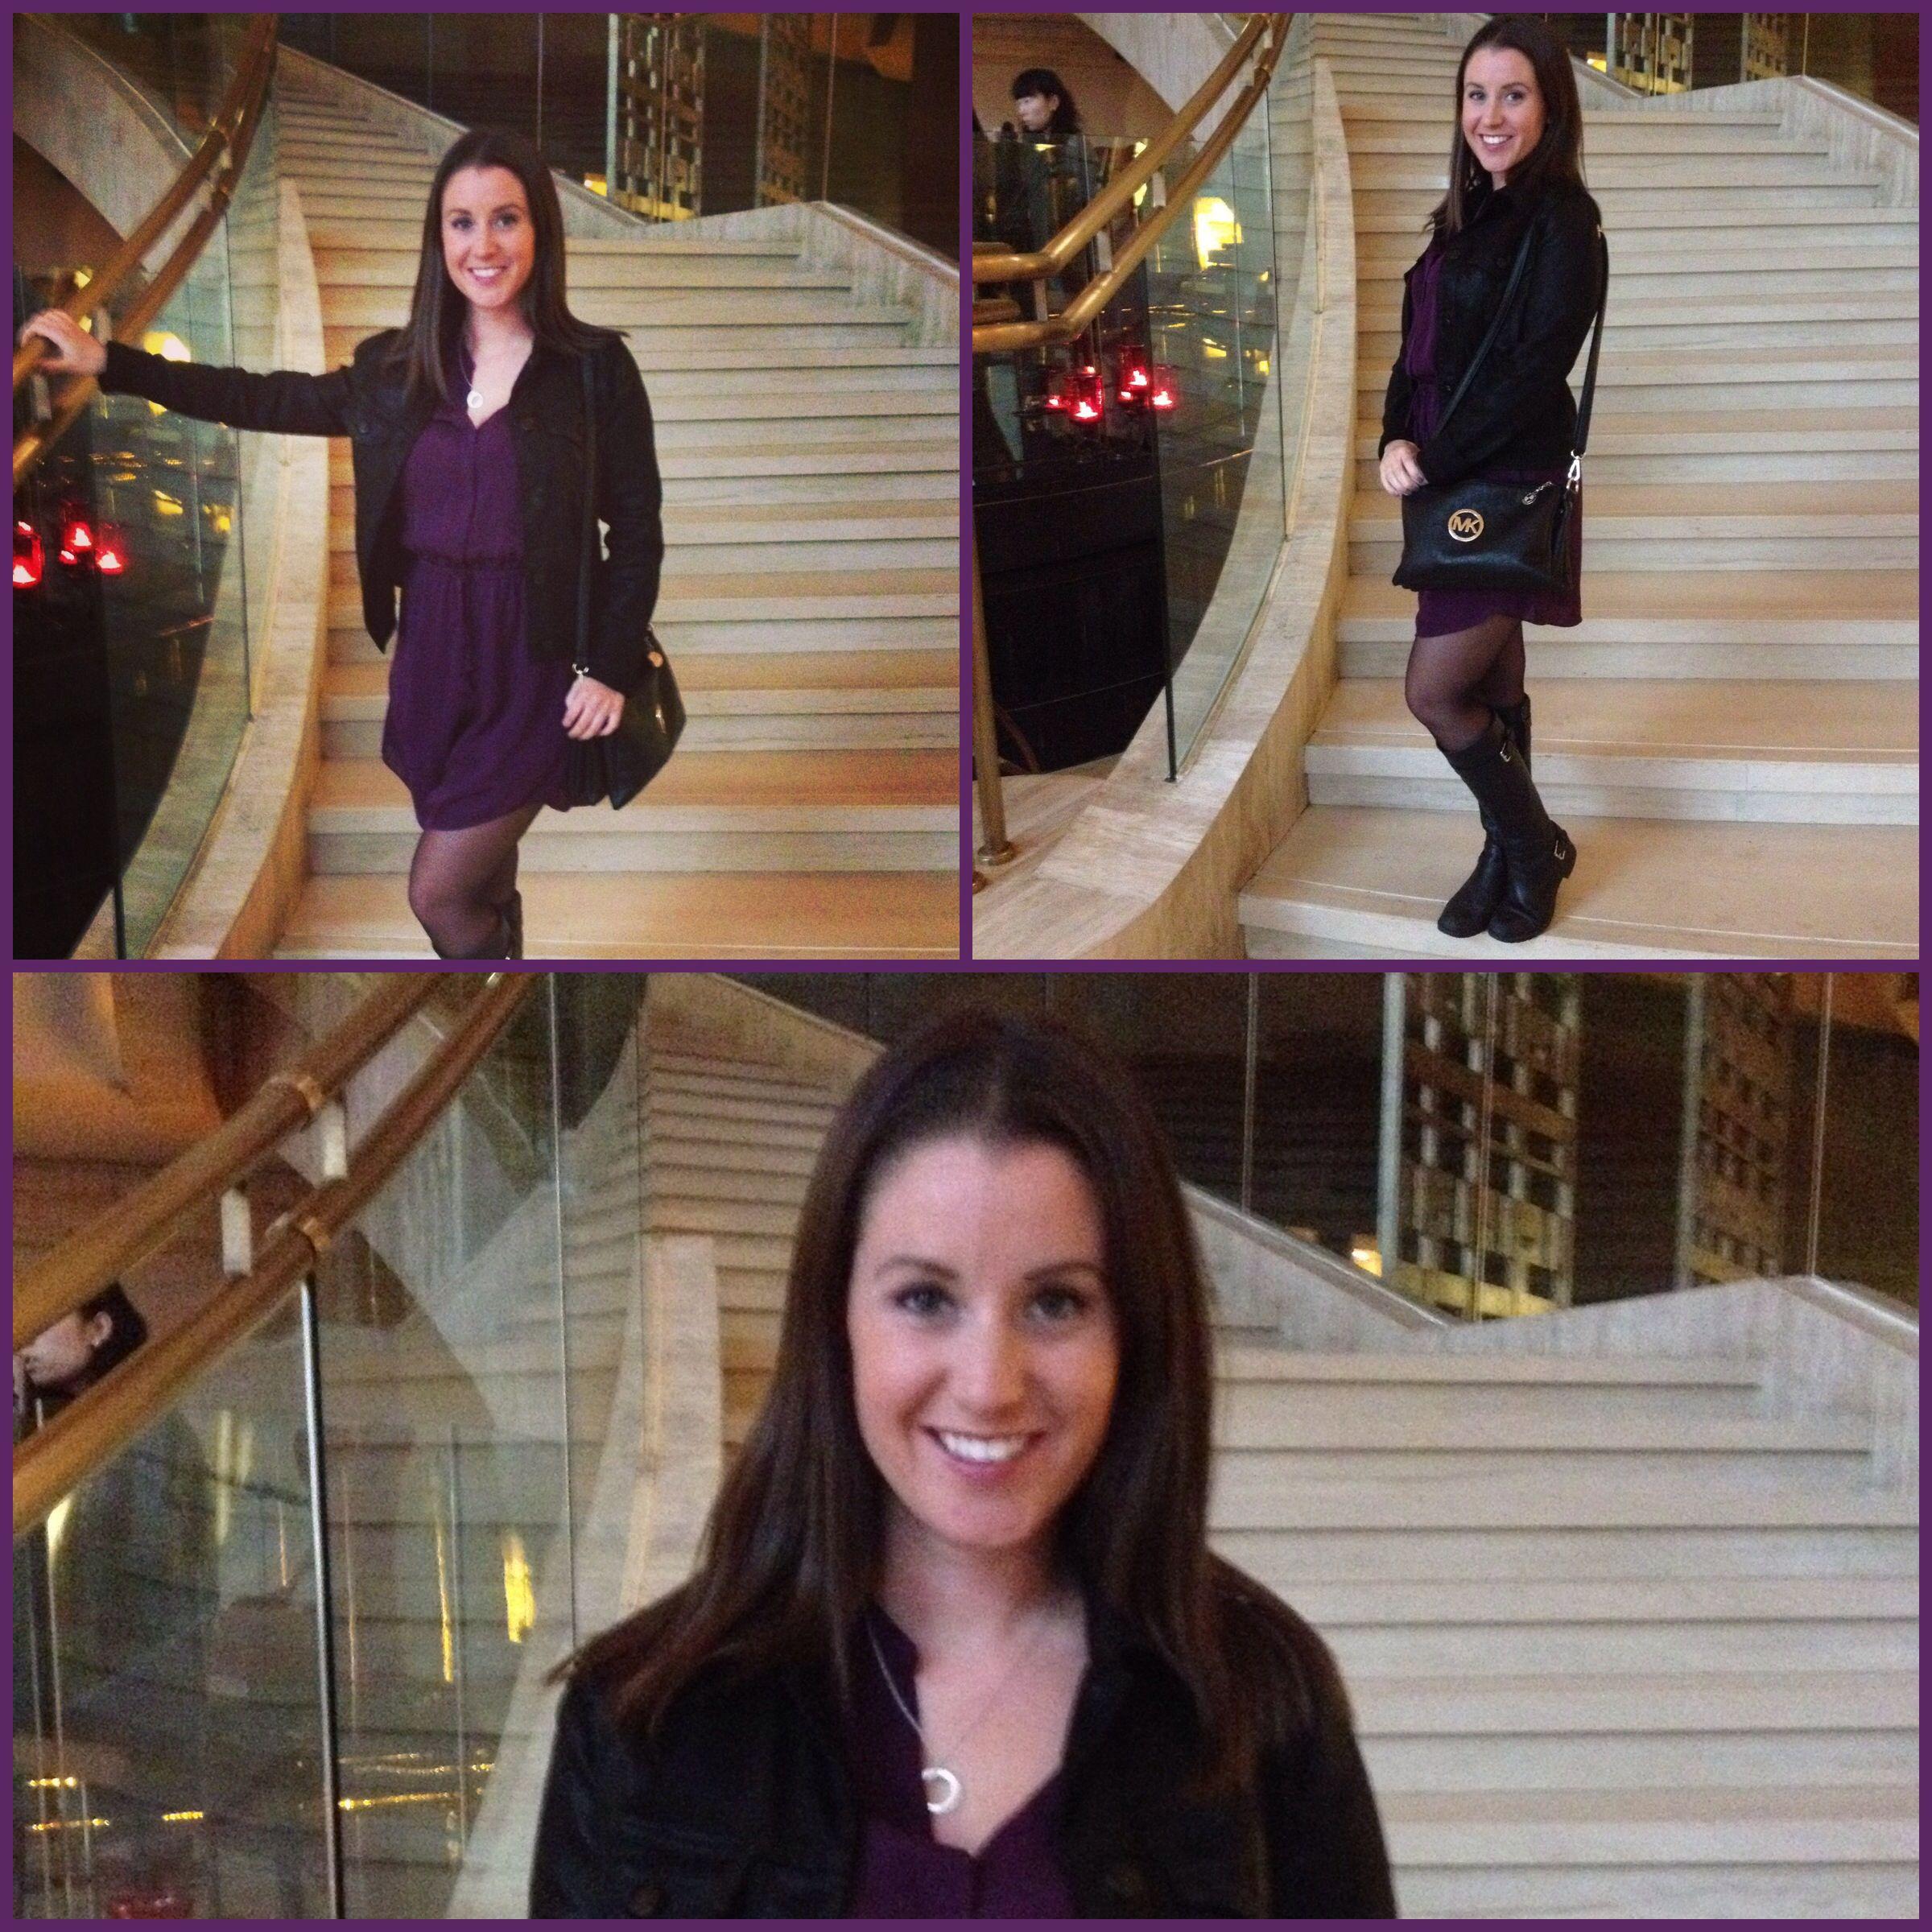 Purple Silk Babbaton Dress from Aritzia, Black Waxed Denim J Brand Jacket from Holt Renfrew, Michael Kors Purse, Tiffany Necklace, Ralph Lauren Boots